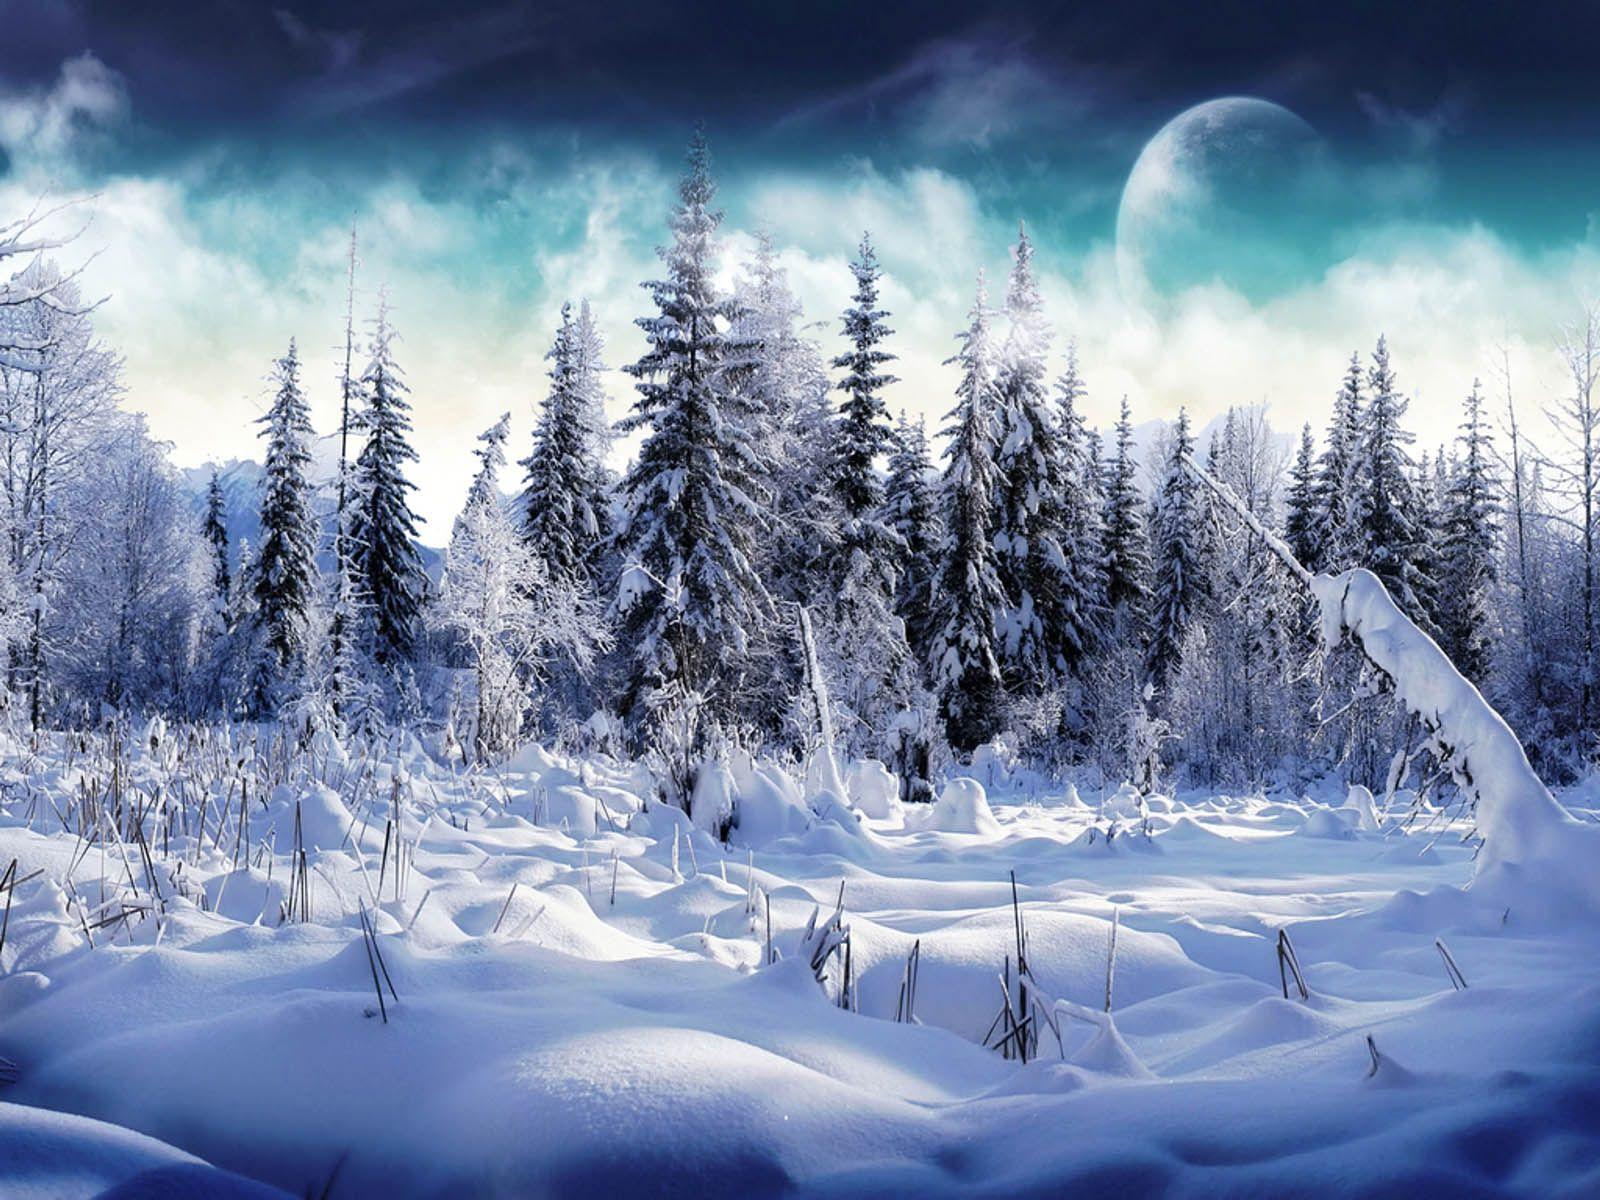 snow avalanche wallpaper desktop background #hmo | earth | pinterest